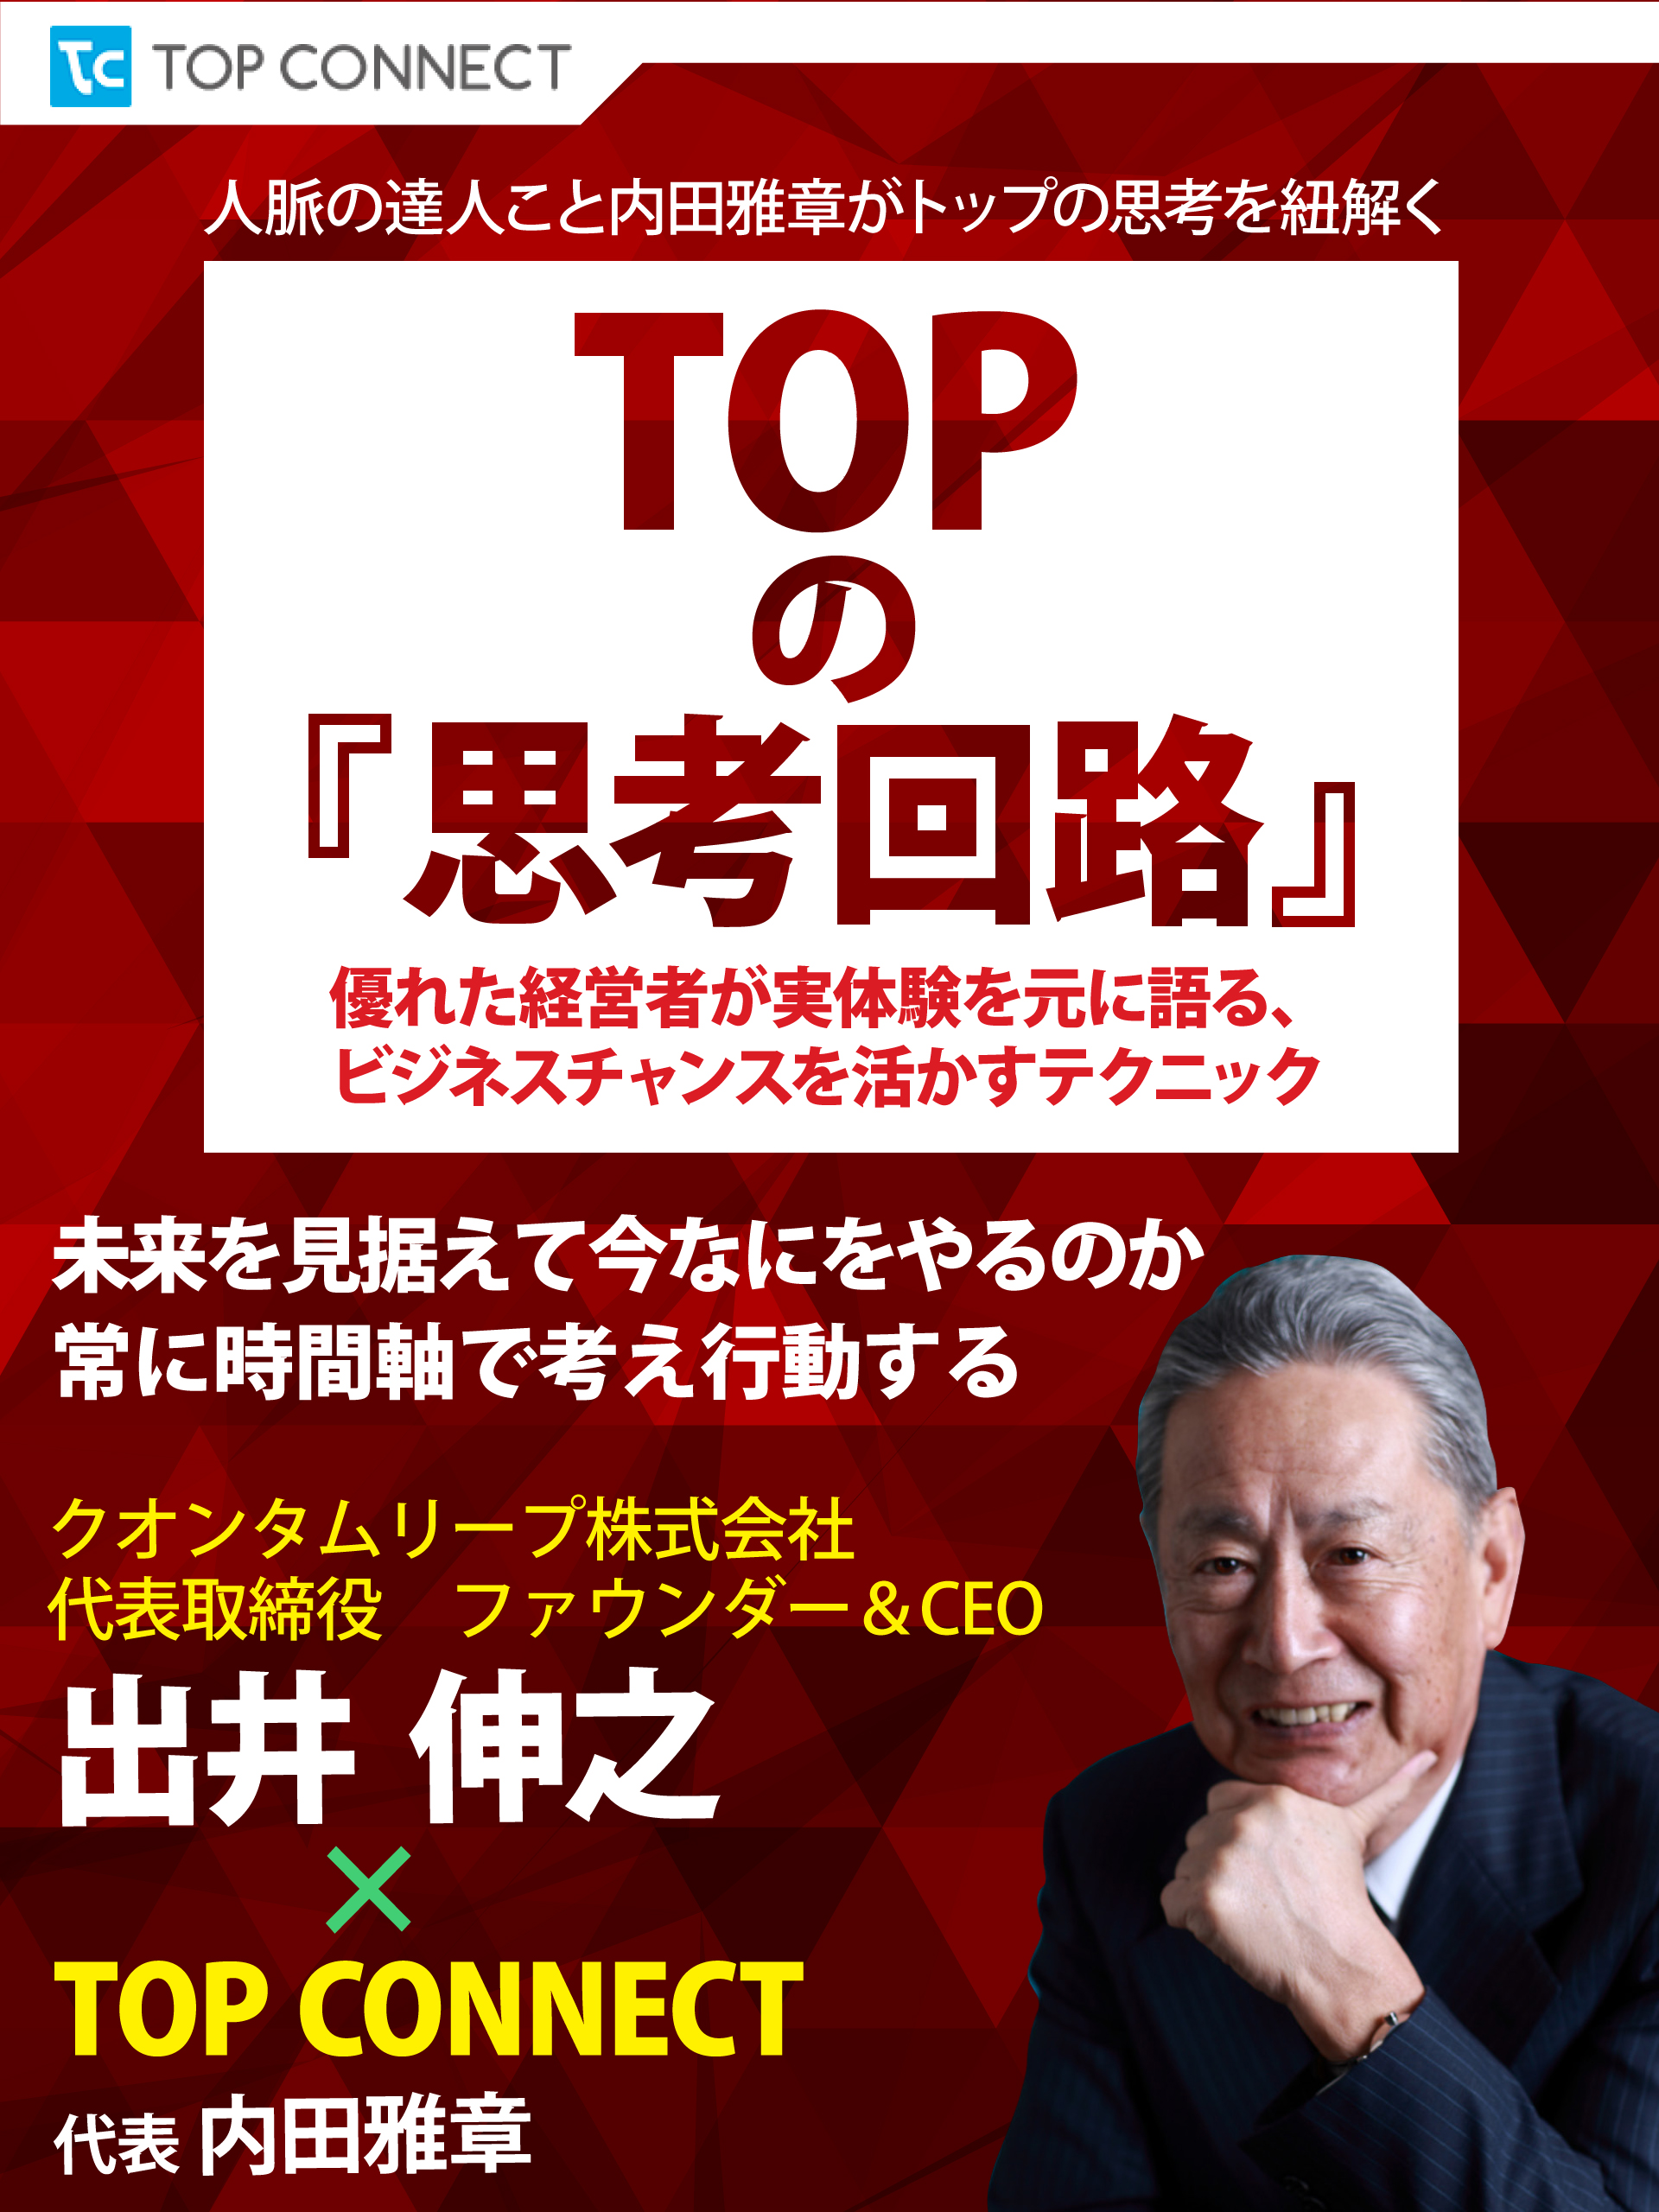 TOPの『思考回路』 クオンタムリープ株式会社 代表取締役 ファウンダー&CEO 出井伸之×TOP CONNECT